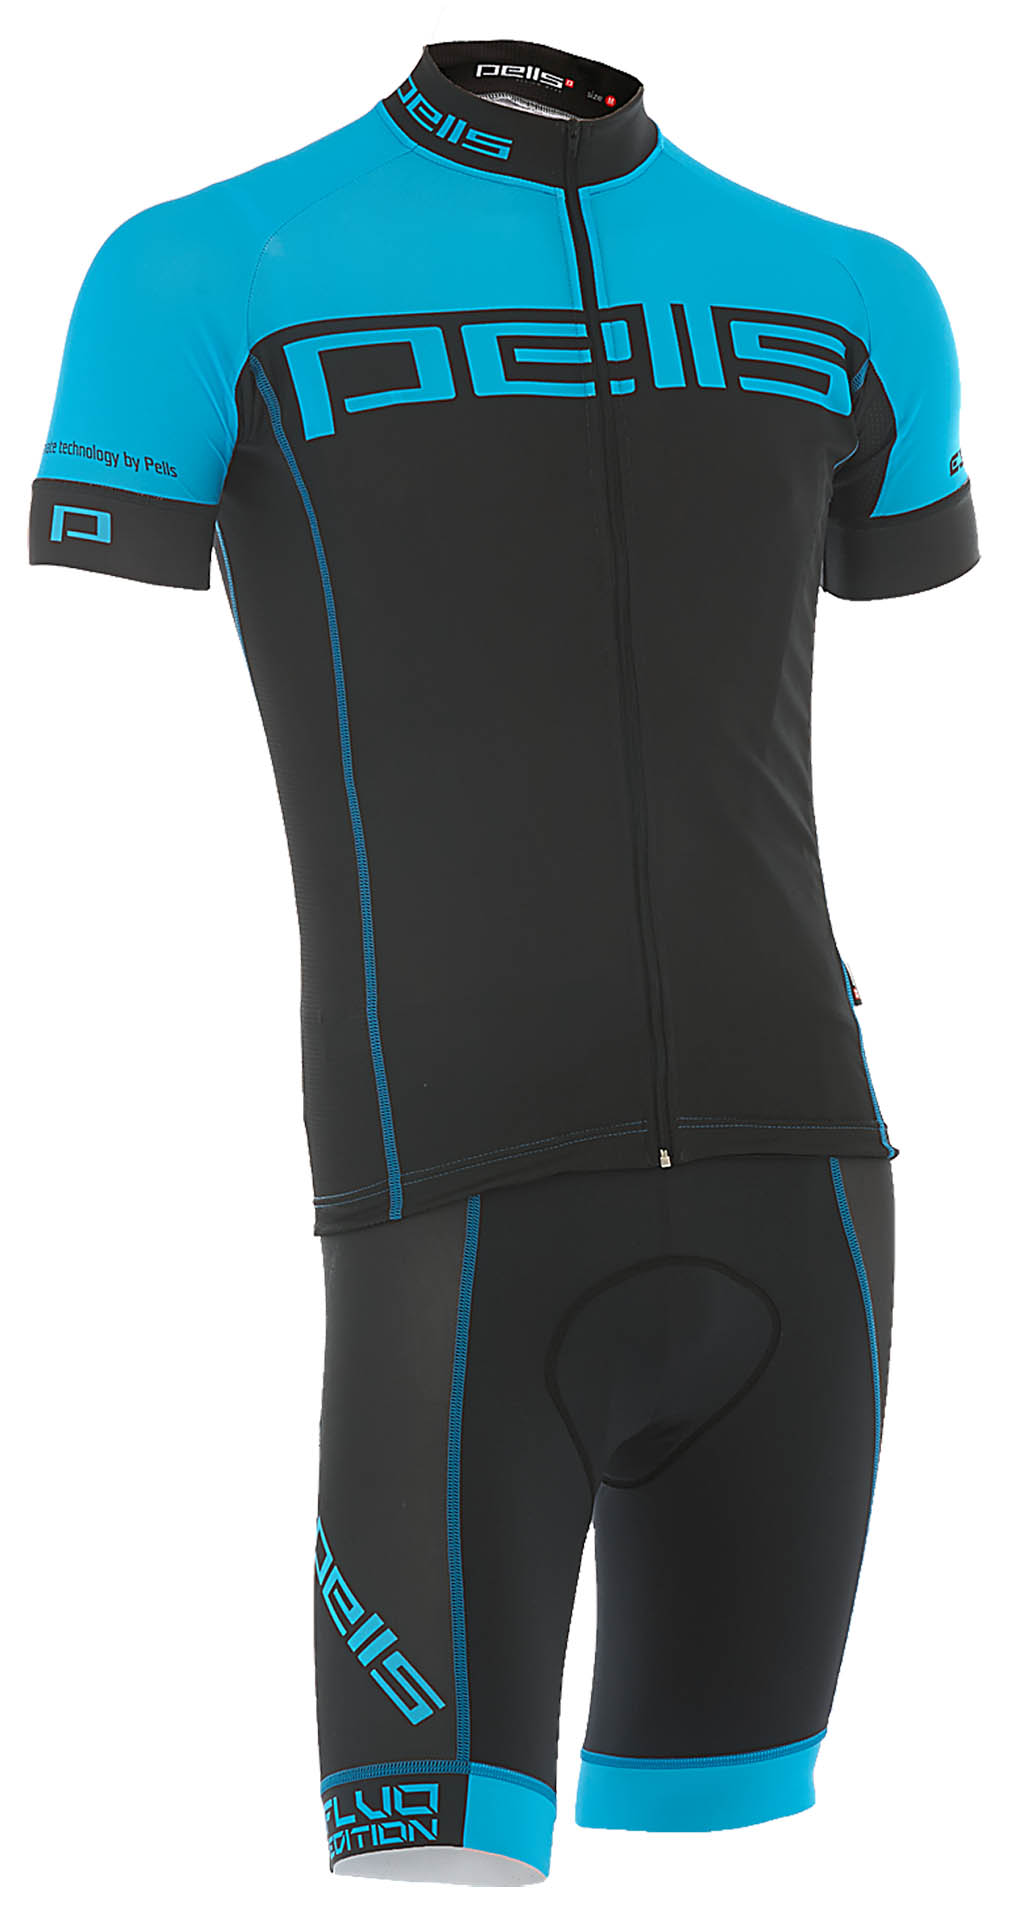 Pánský dres PELL'S FLUO, vel. XXL, modrá, krátký rukáv - ZDARMA DOPRAVNÉ! (Pánský cyklistický dres PELL'S, vel. XXL, krátký rukáv, barva modrá dle vyobrazení!)